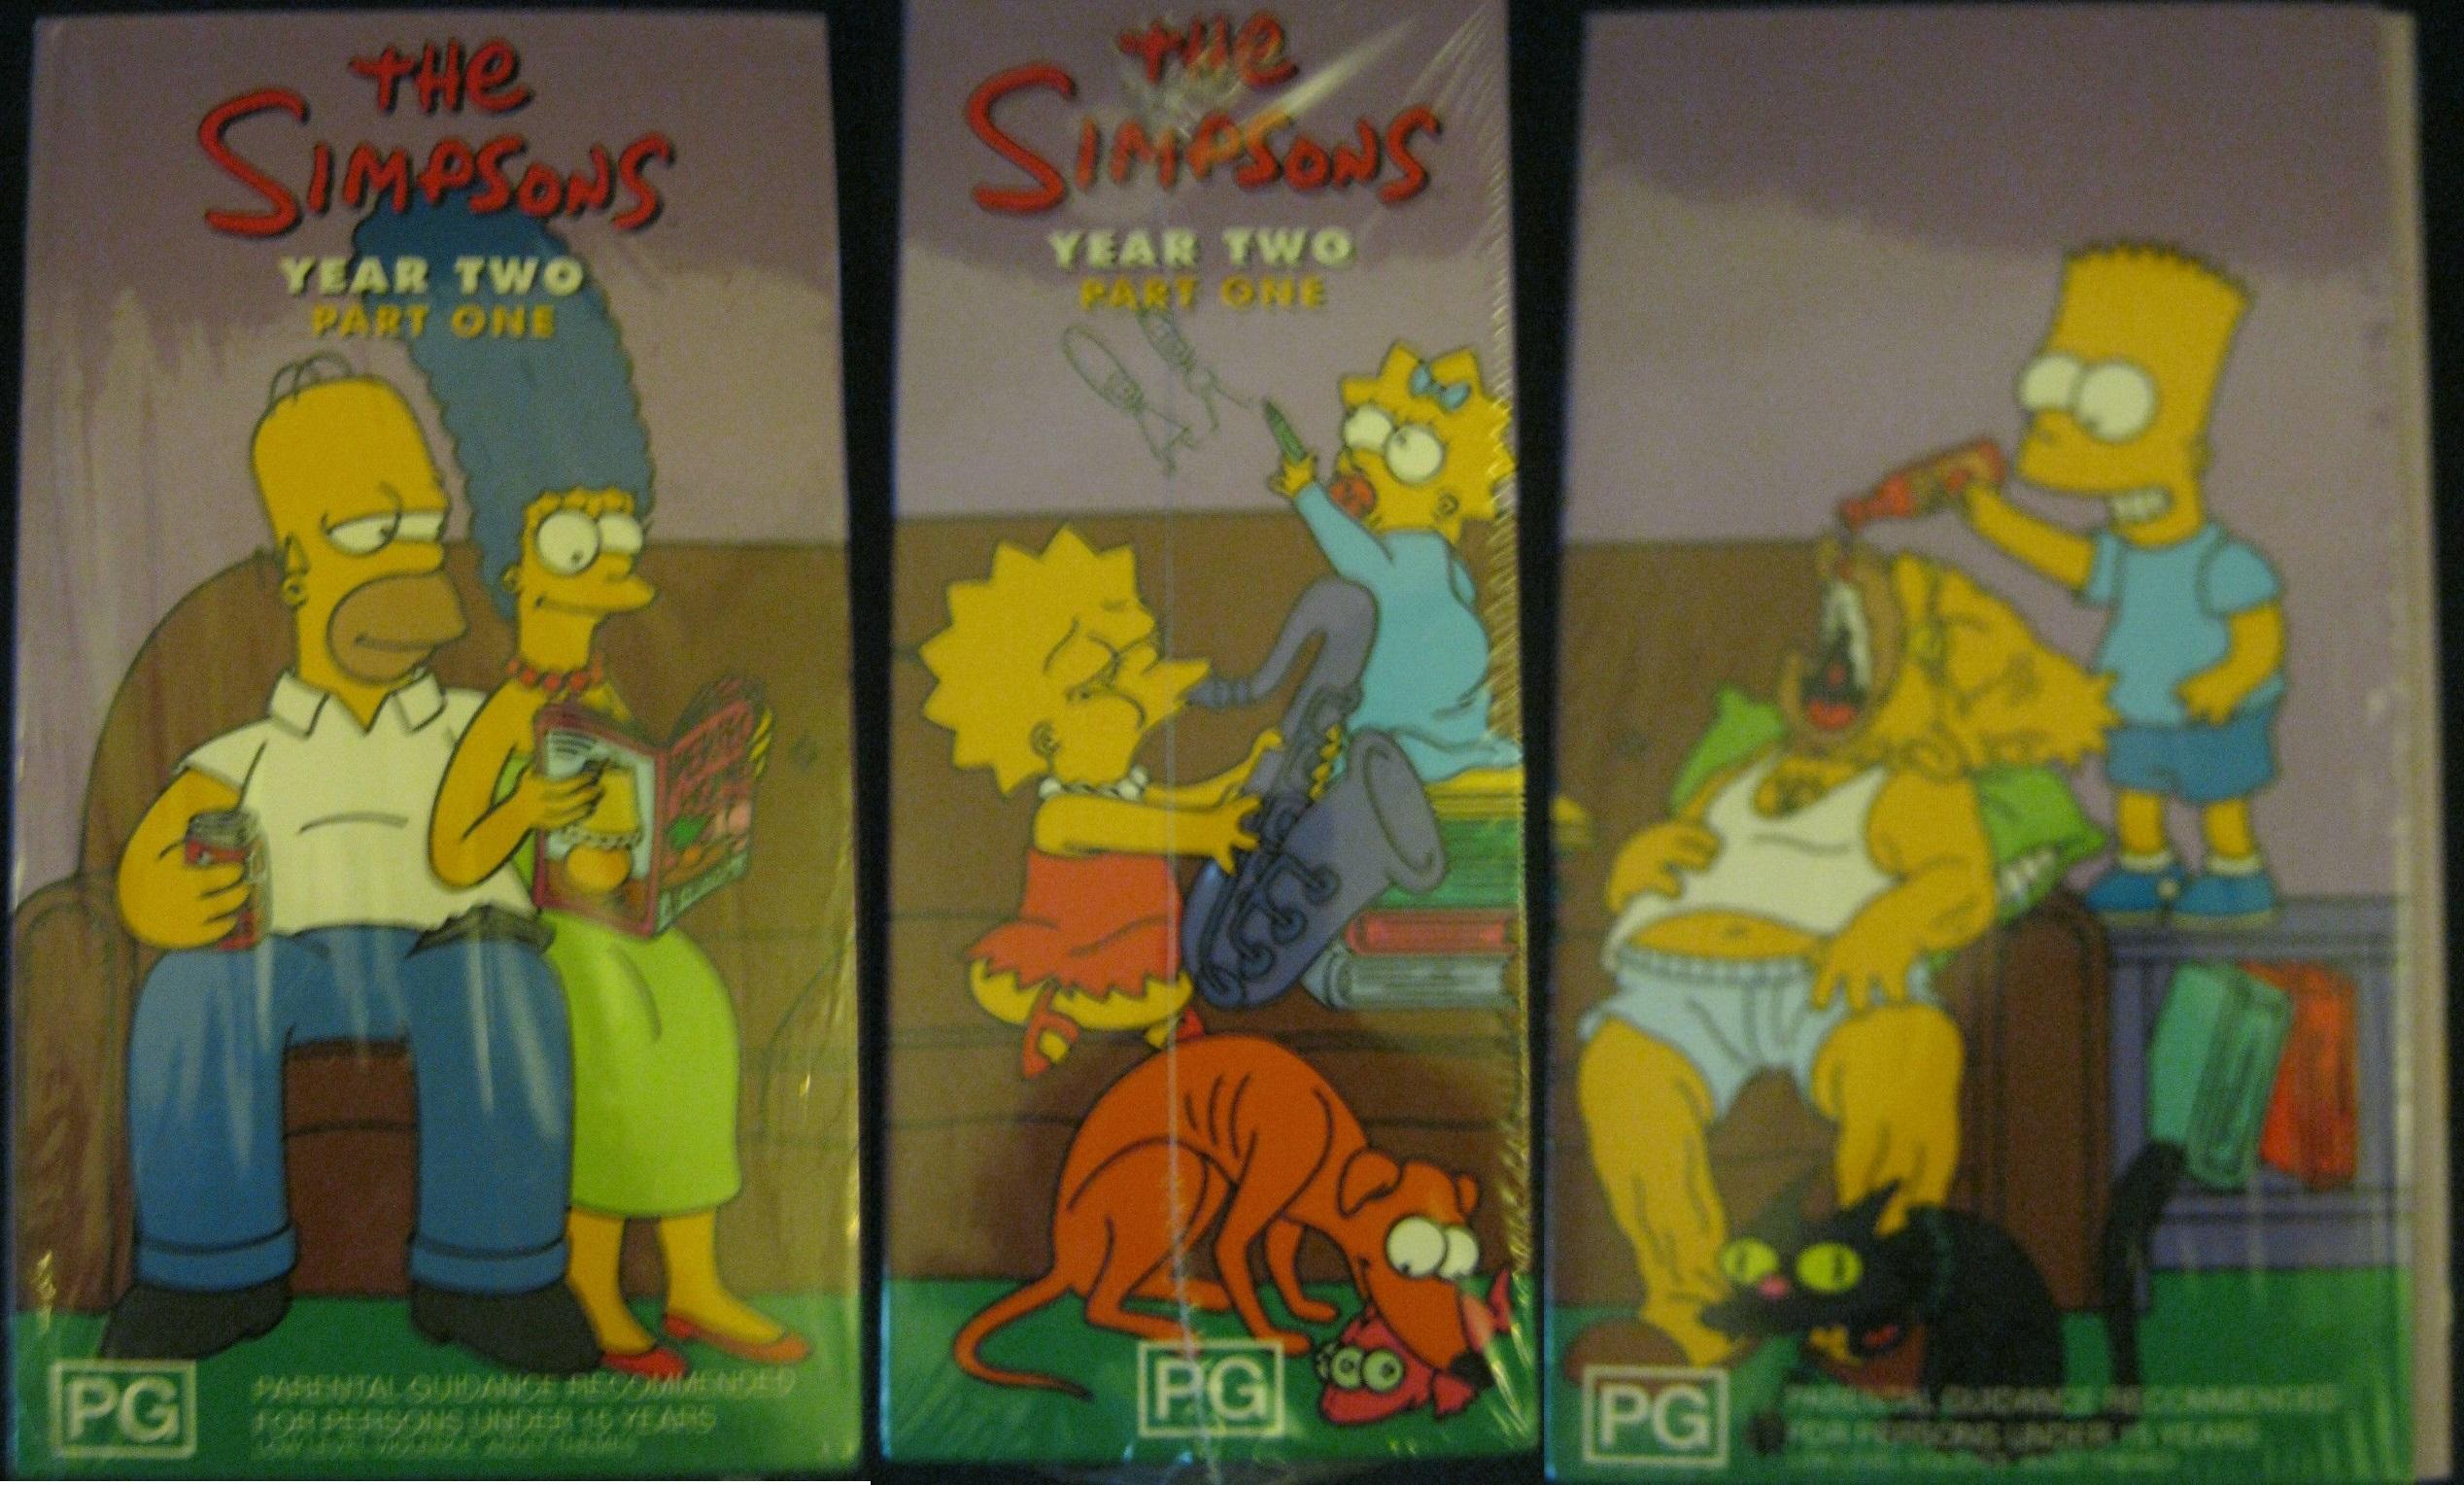 The Simpsons Year 2 Part 1 Box Australia.jpg